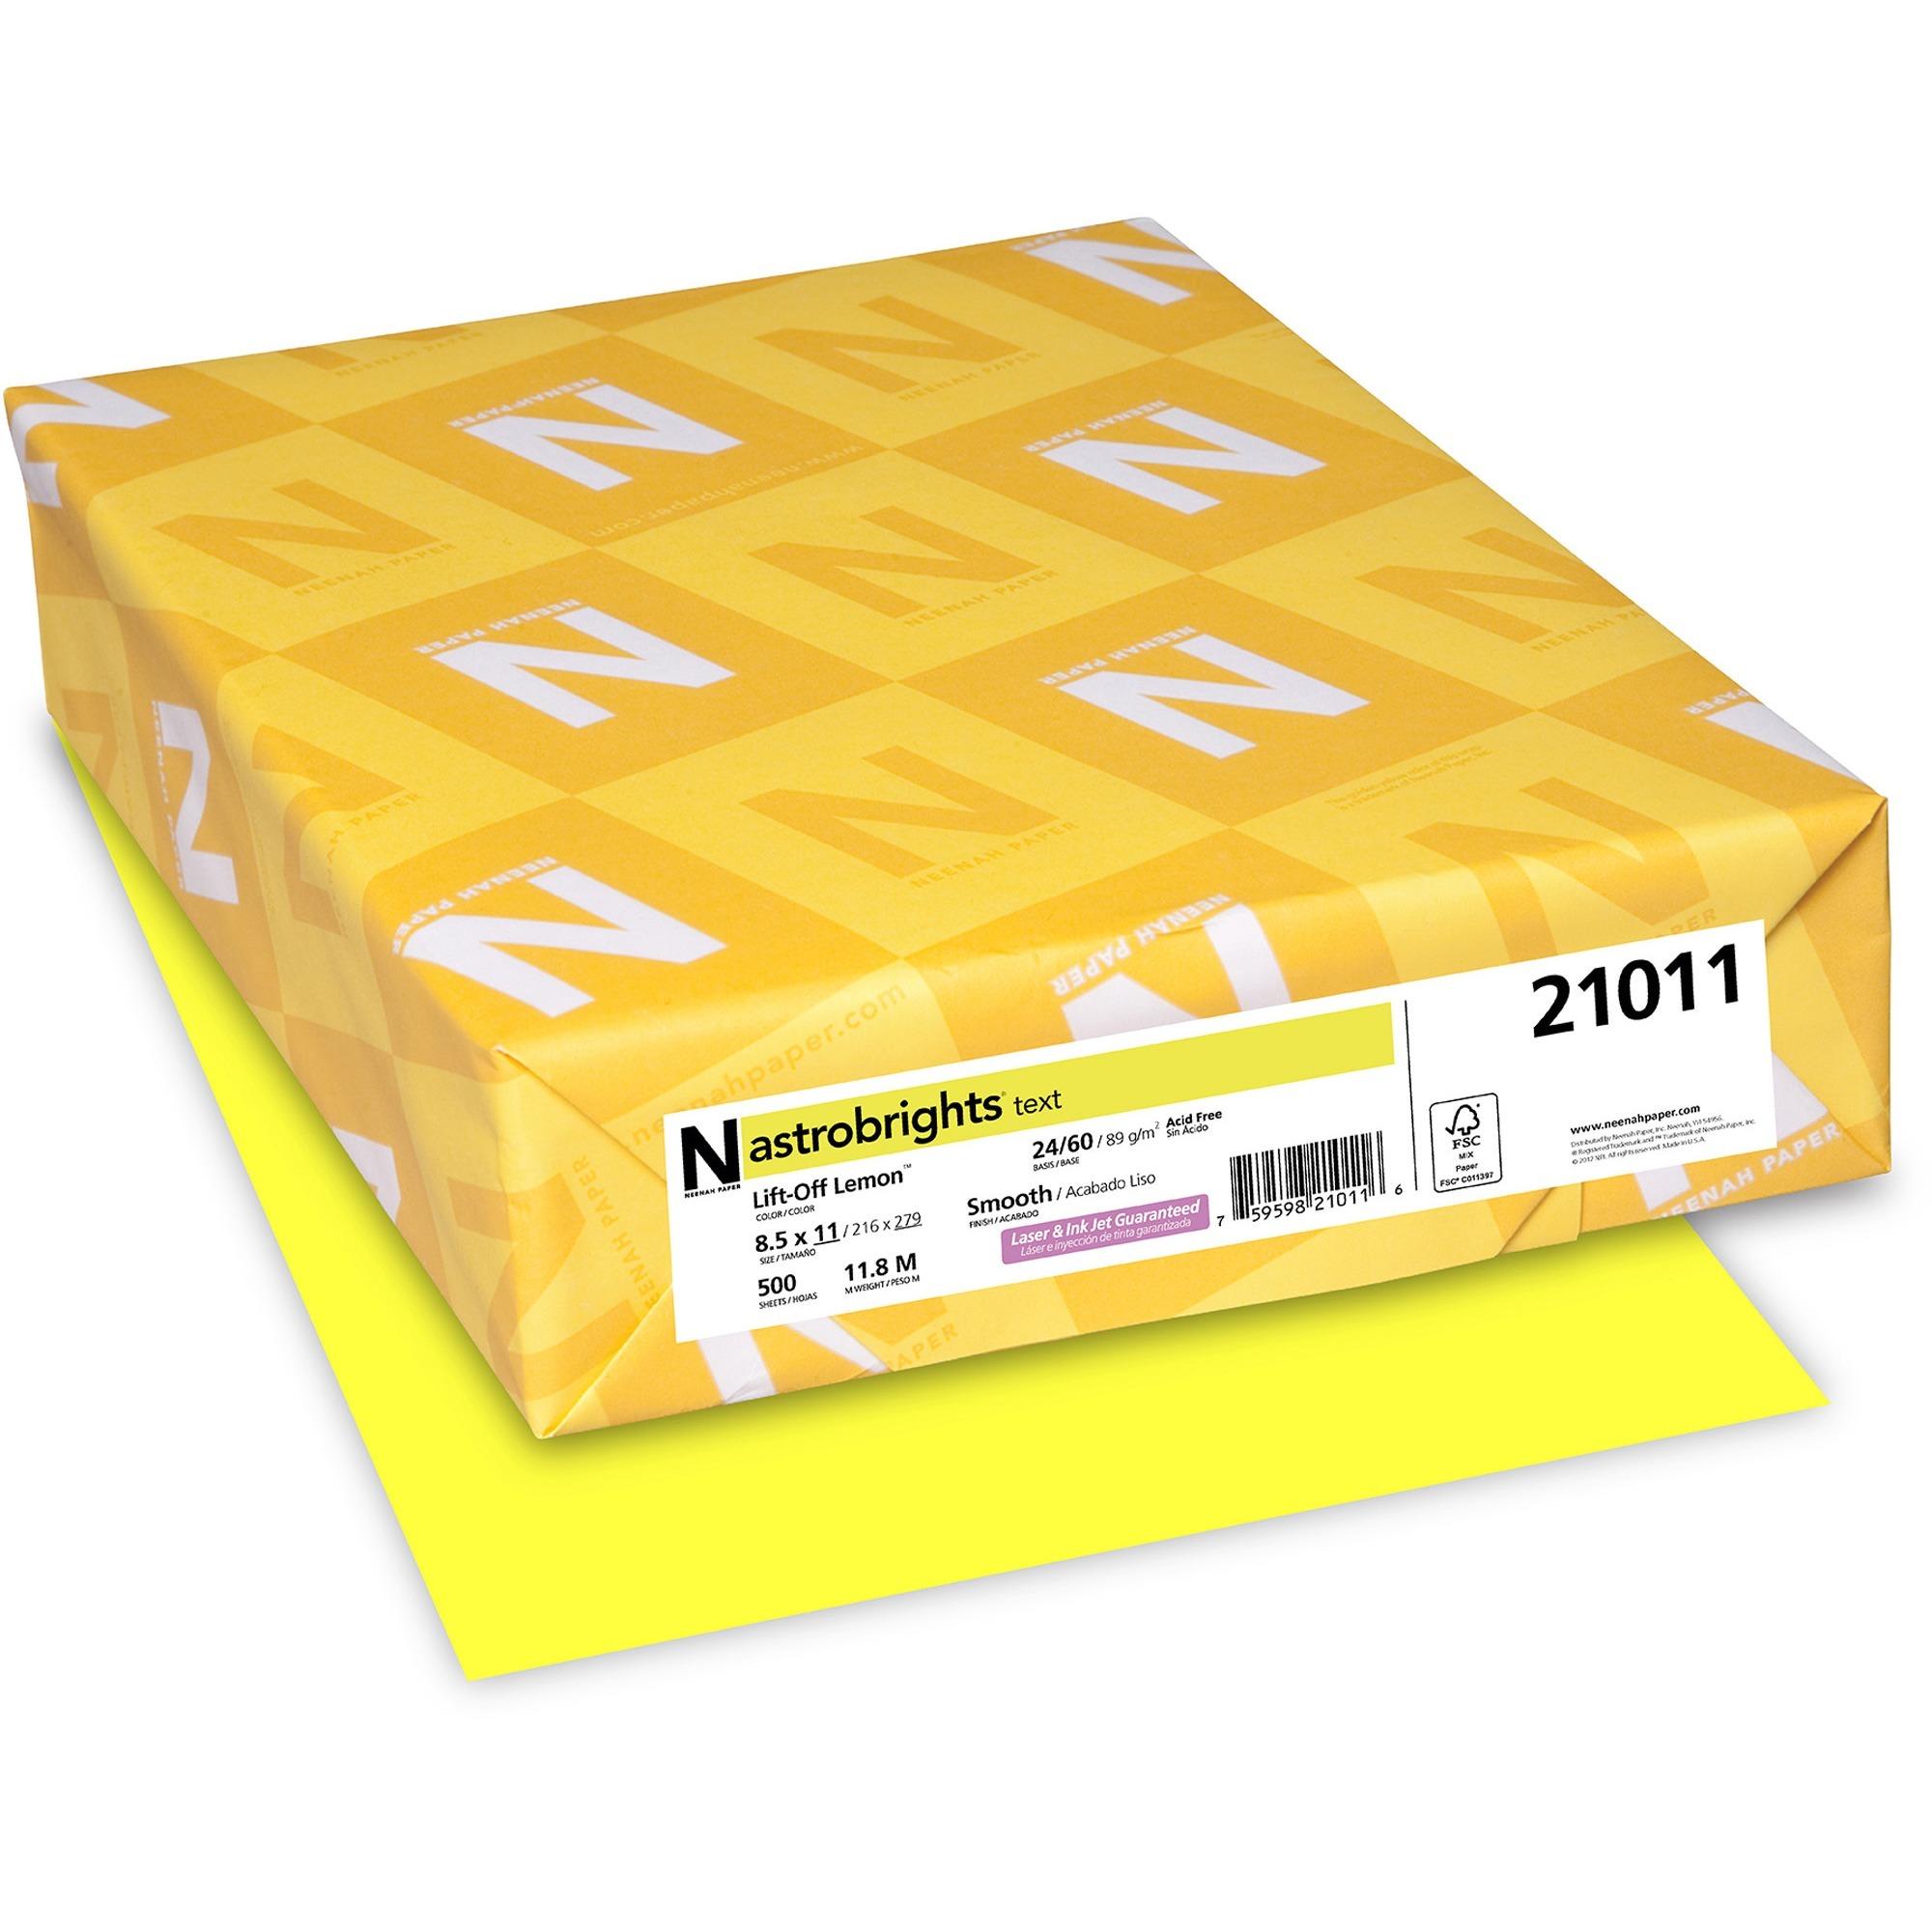 Astrobrights, WAU21011, Color Paper, 500 / Ream, Lemon (Yellow)